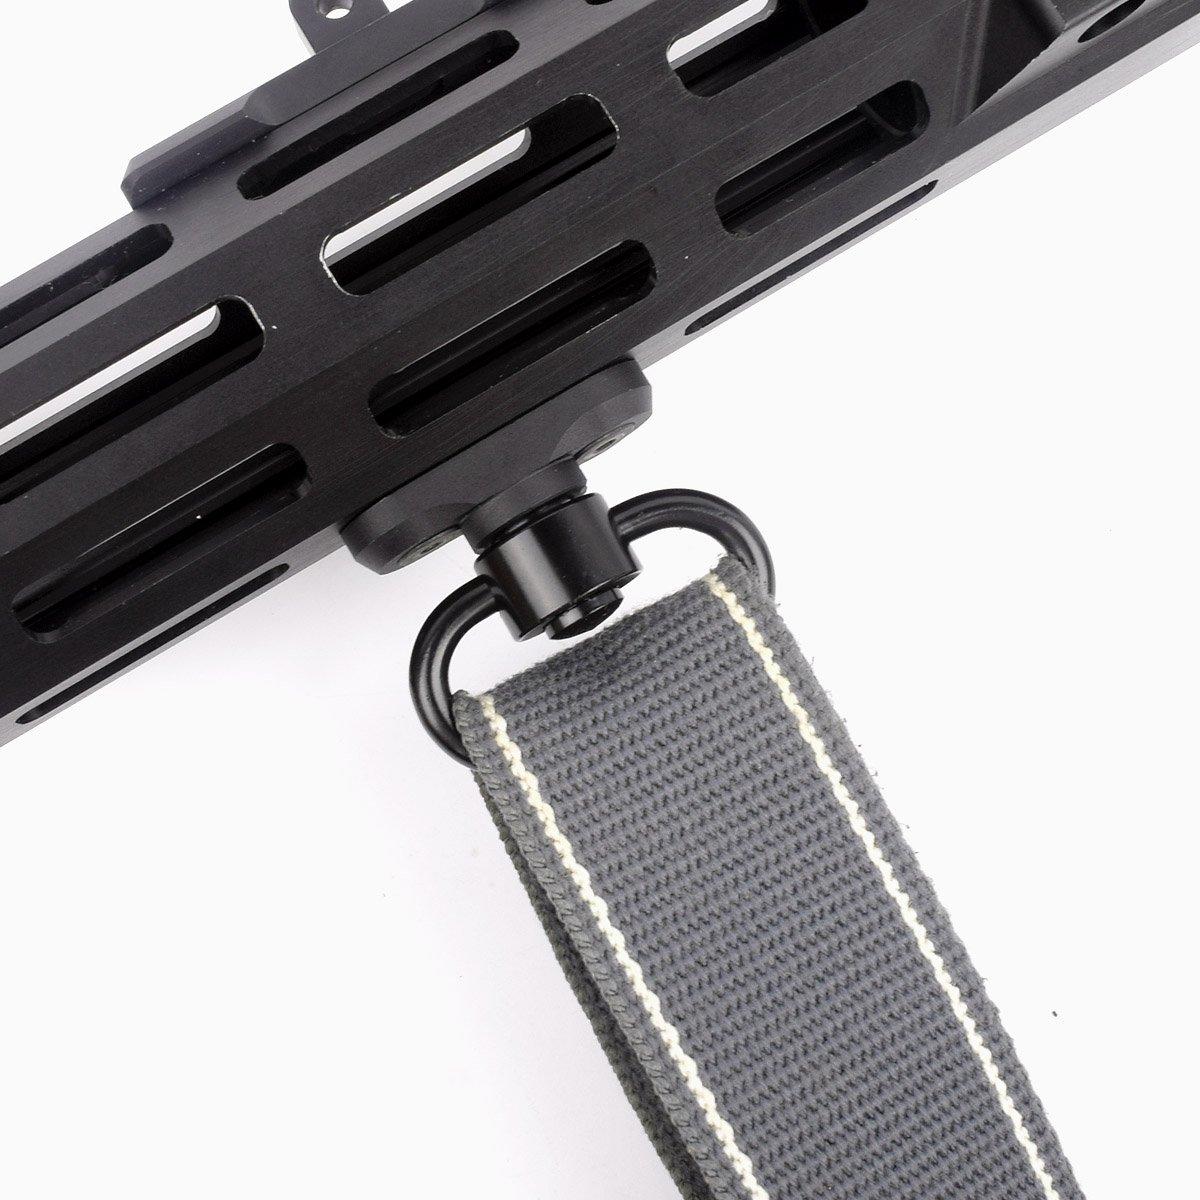 CRUSHUNT M-lok QD Sling Mount Sling Swivel 1.25 inch Adapter Attachment M lok Hand-Guard Set by CRUSHUNT (Image #5)